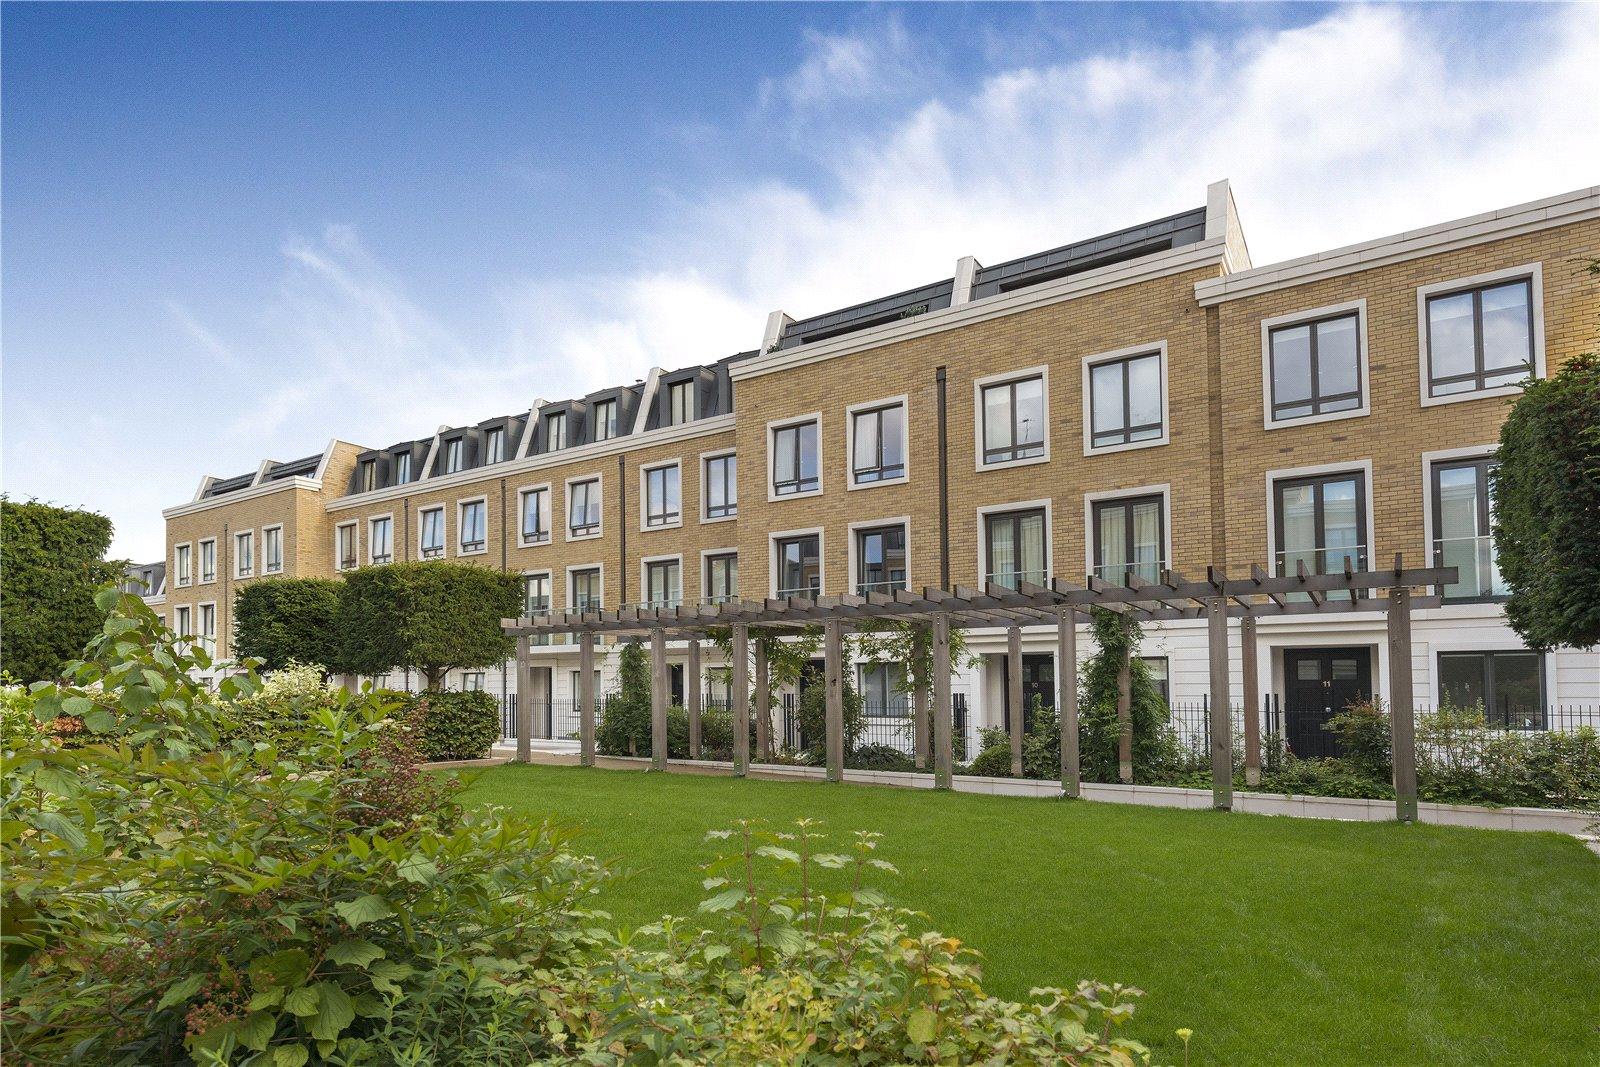 House for Sale at Rainsborough Square, Fulham, London, SW6 Rainsborough Square, Fulham, London, SW6